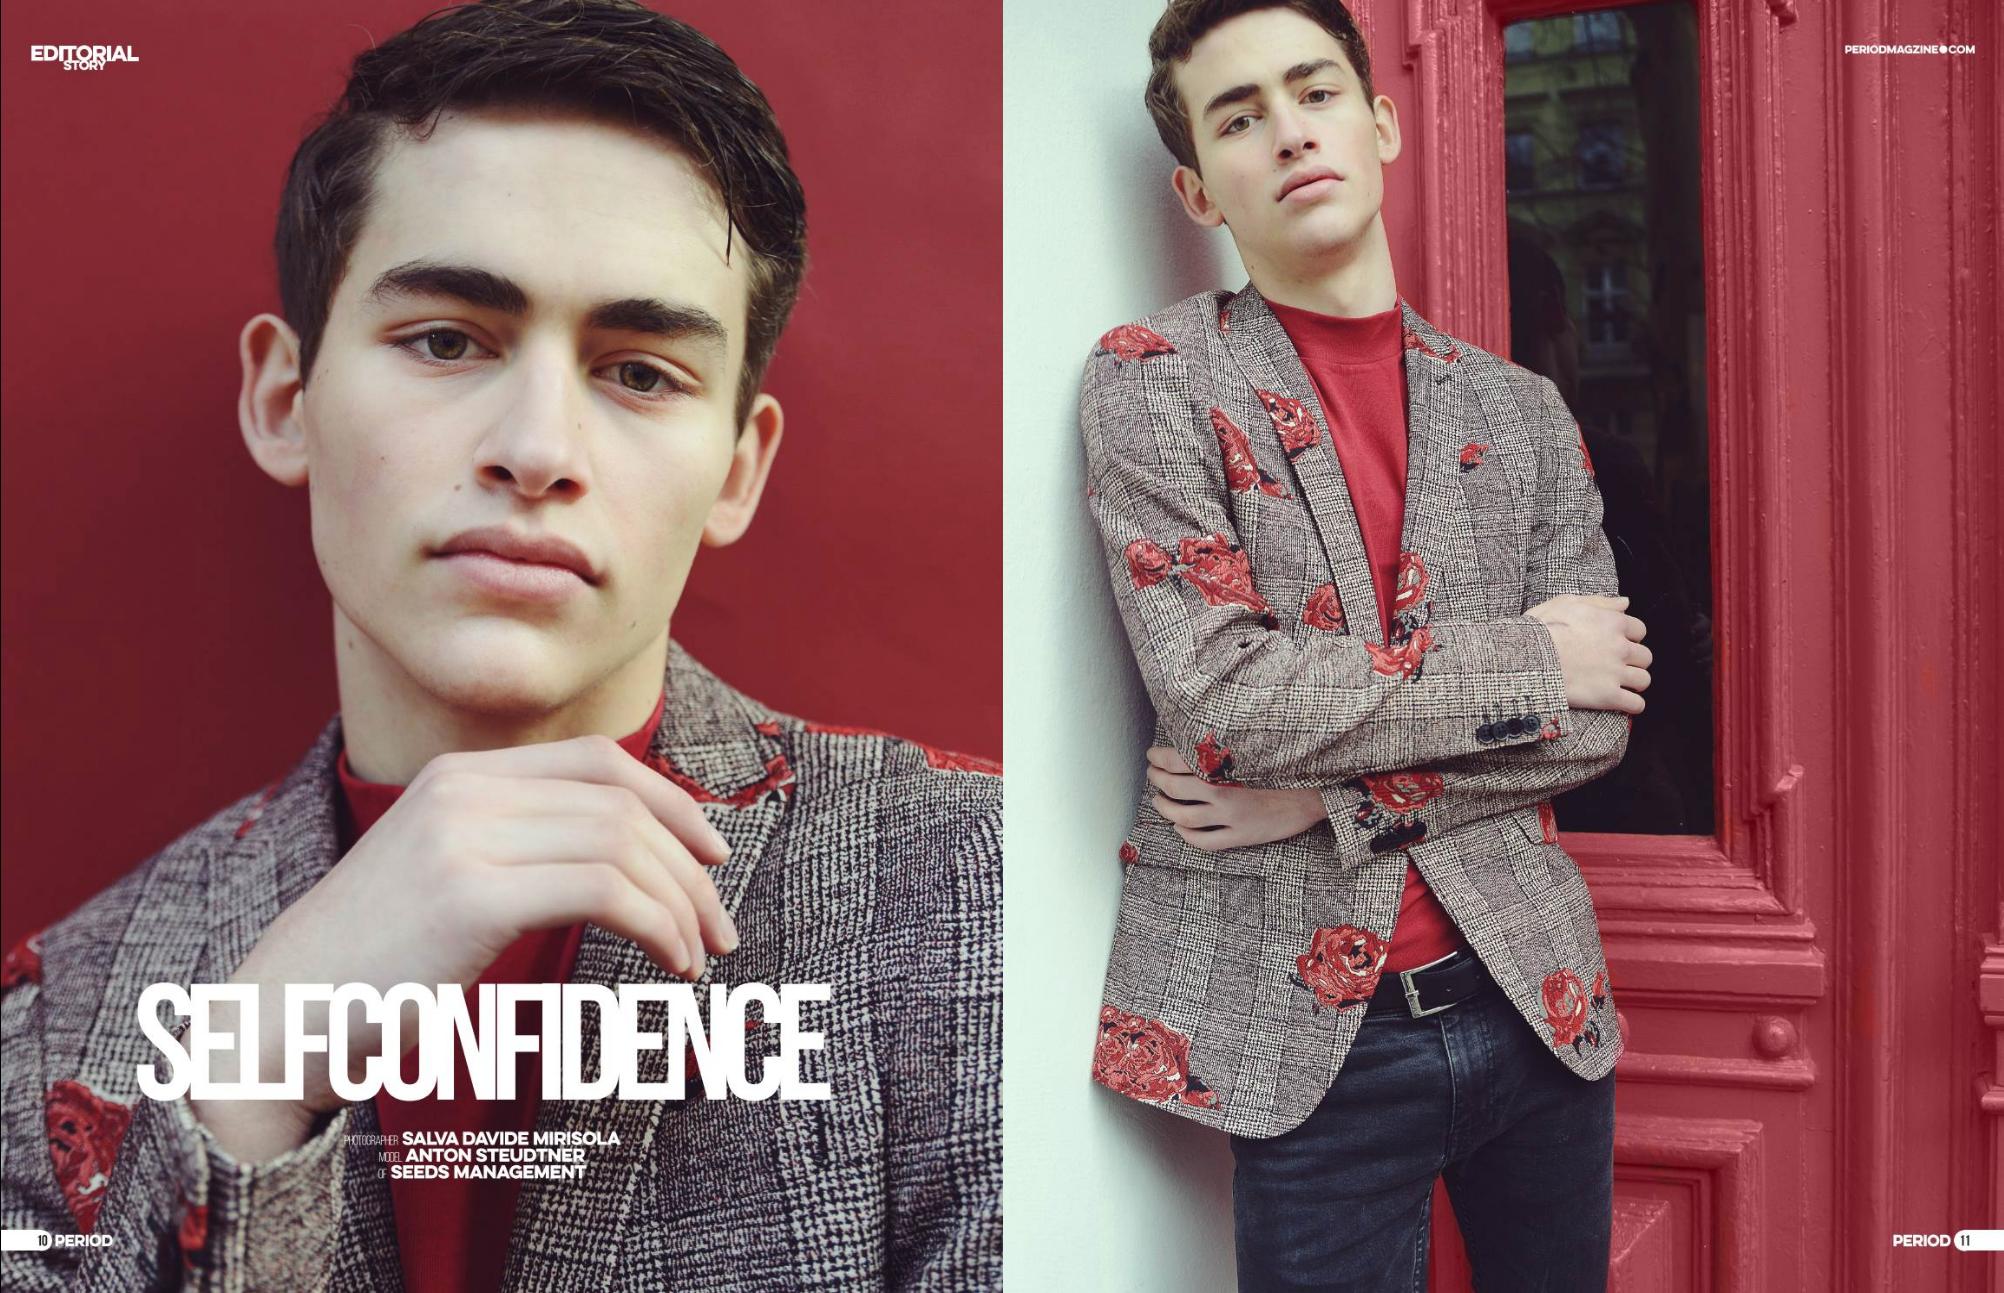 PERIOD magazine - selfconfidence